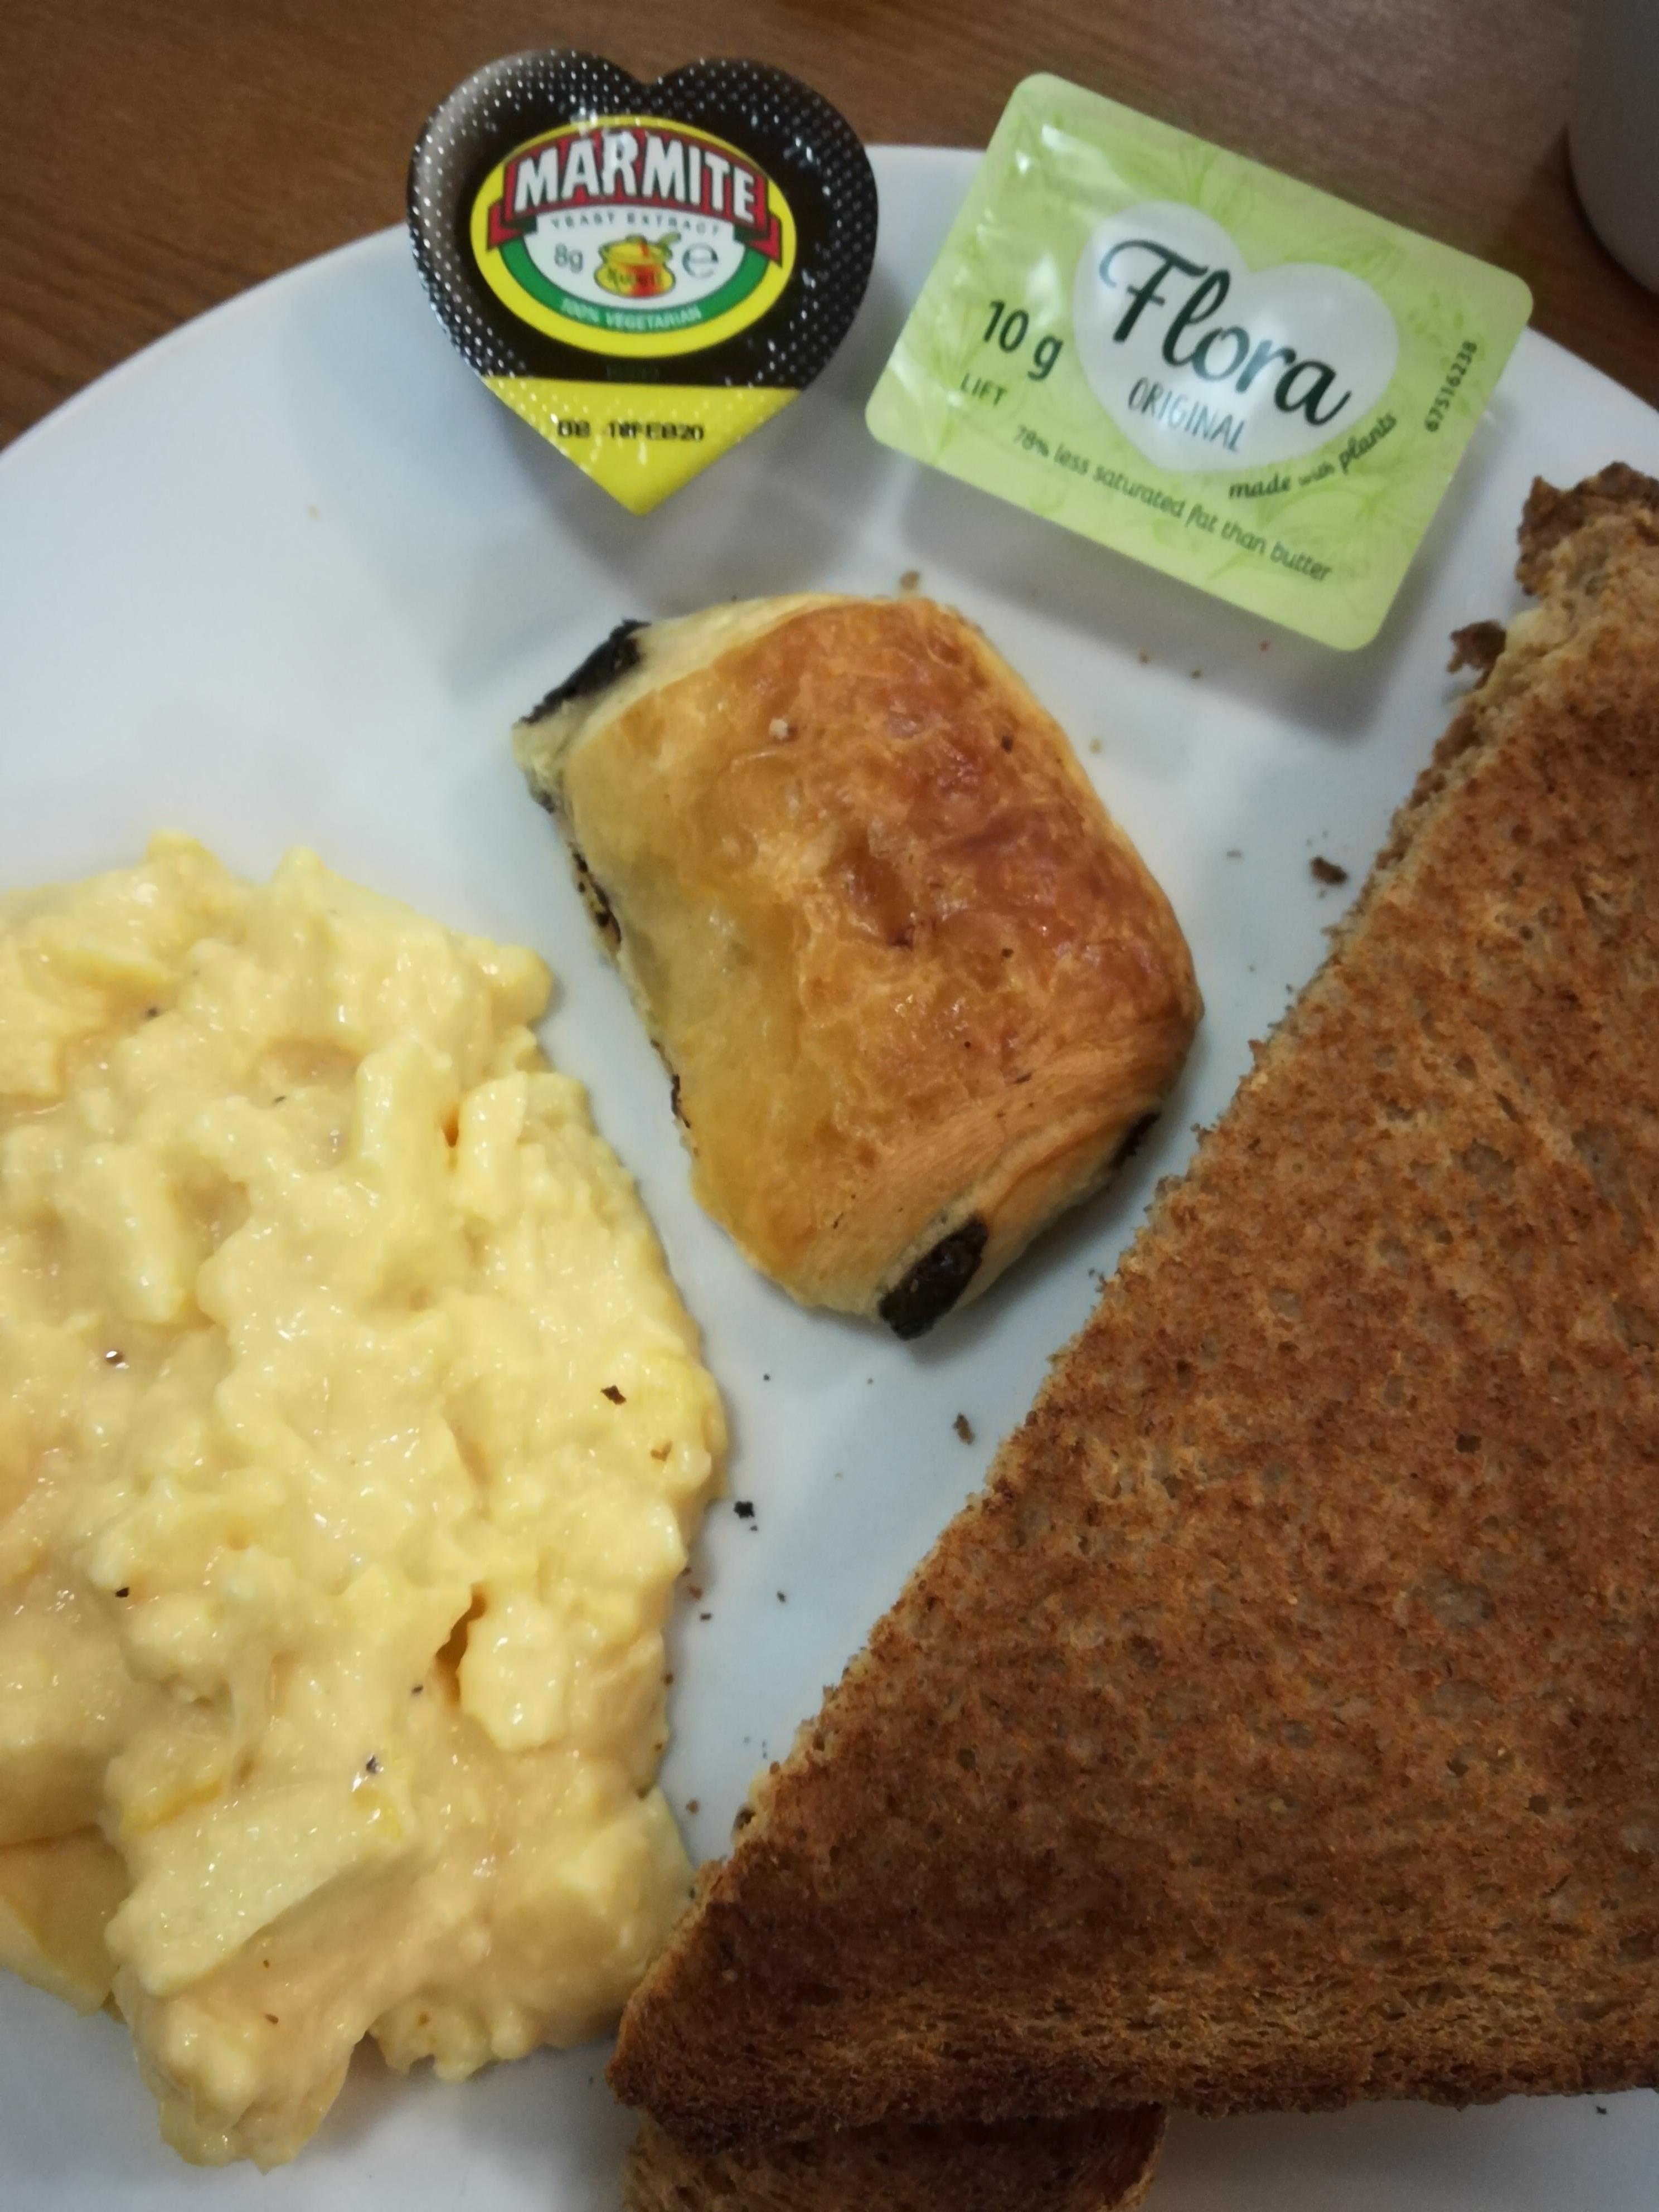 Marmite❤️, butter, bread, scrumbled eggs, pain au chocolat